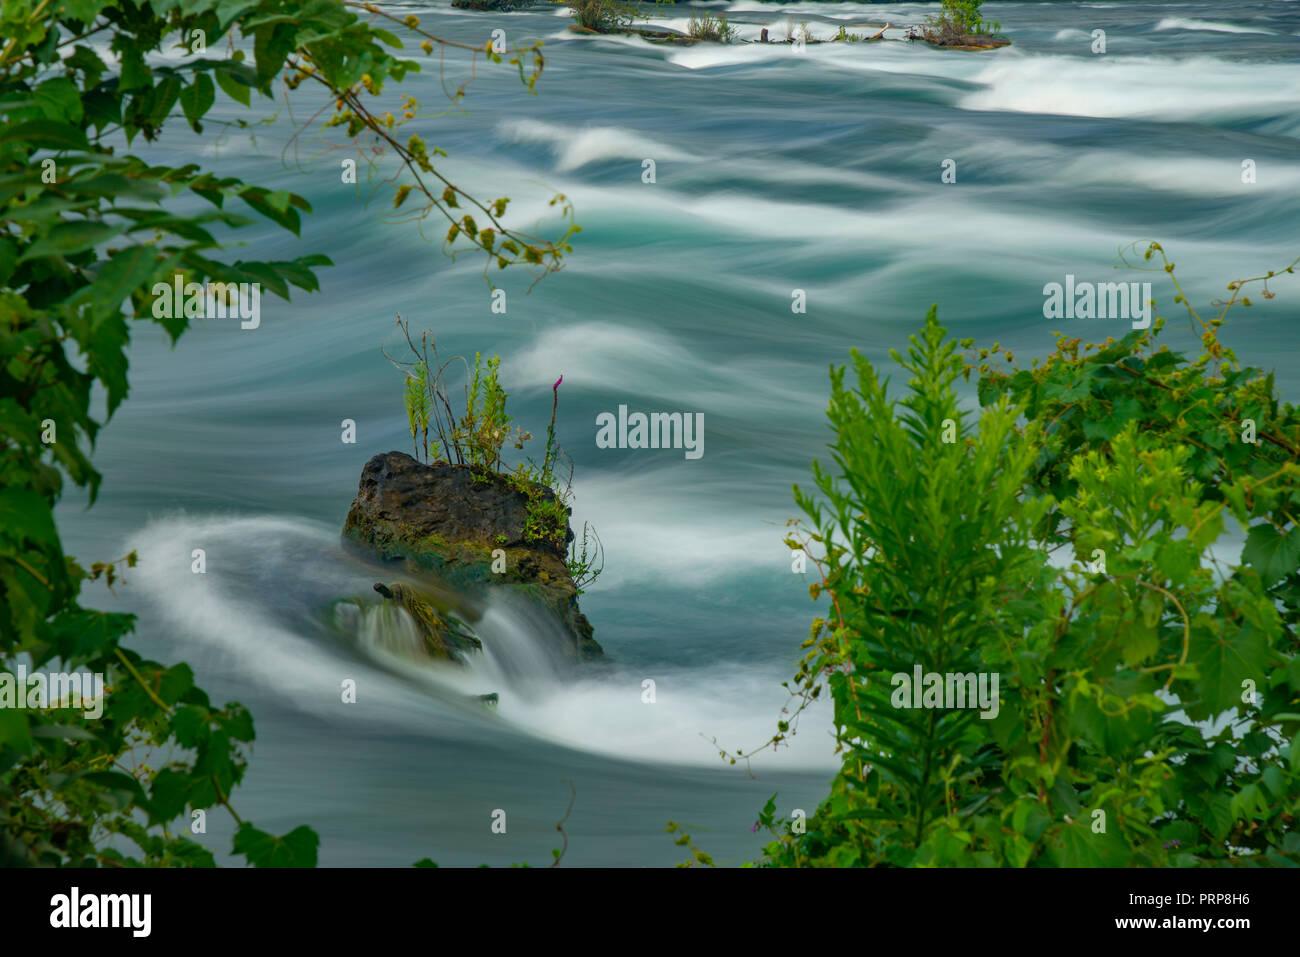 Flowing Blurry Water, Niagara River, New York USA - Stock Image